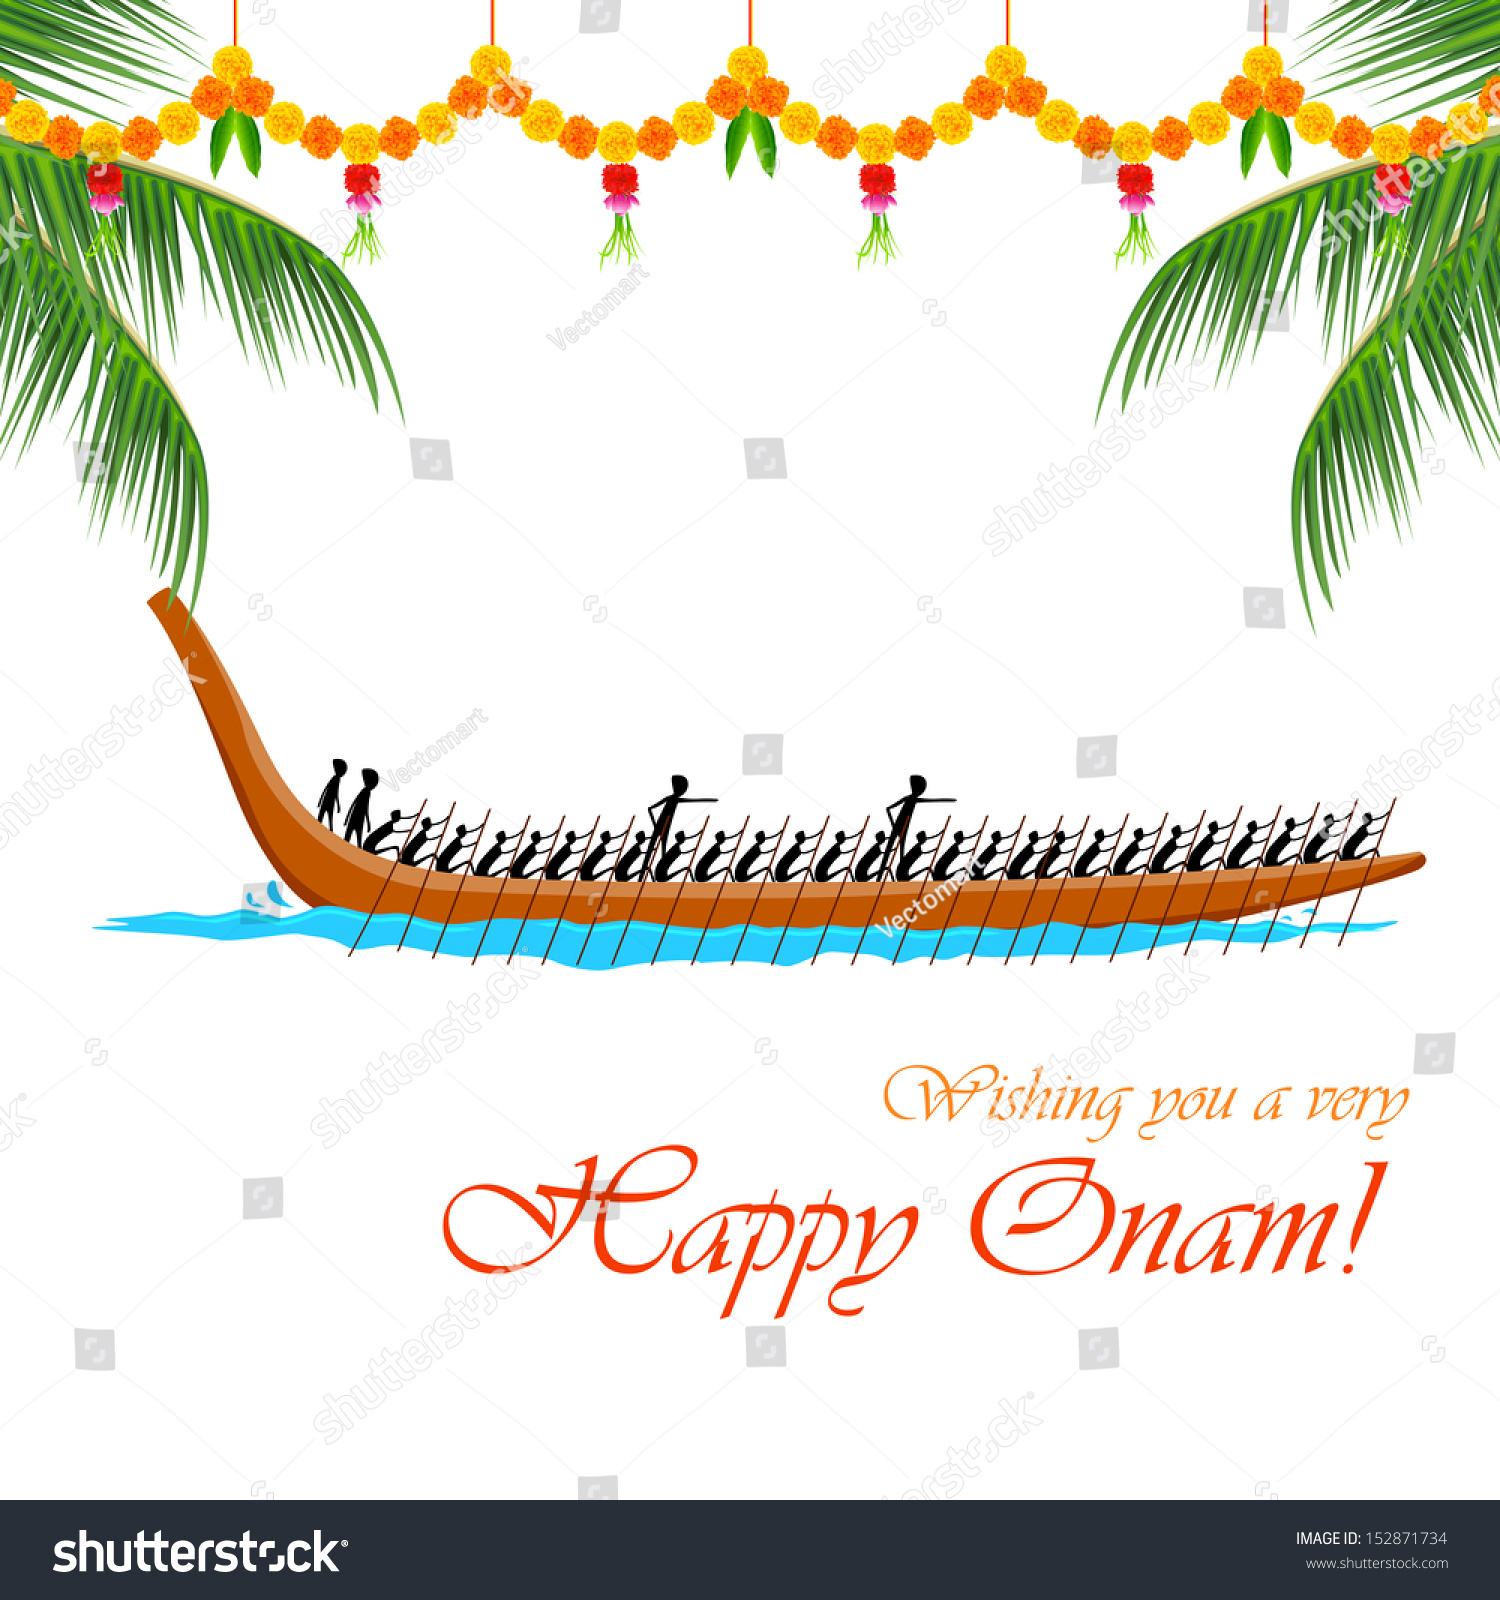 illustration of Boat Race of Kerla on Onam - Onam Festival Boat Race PNG